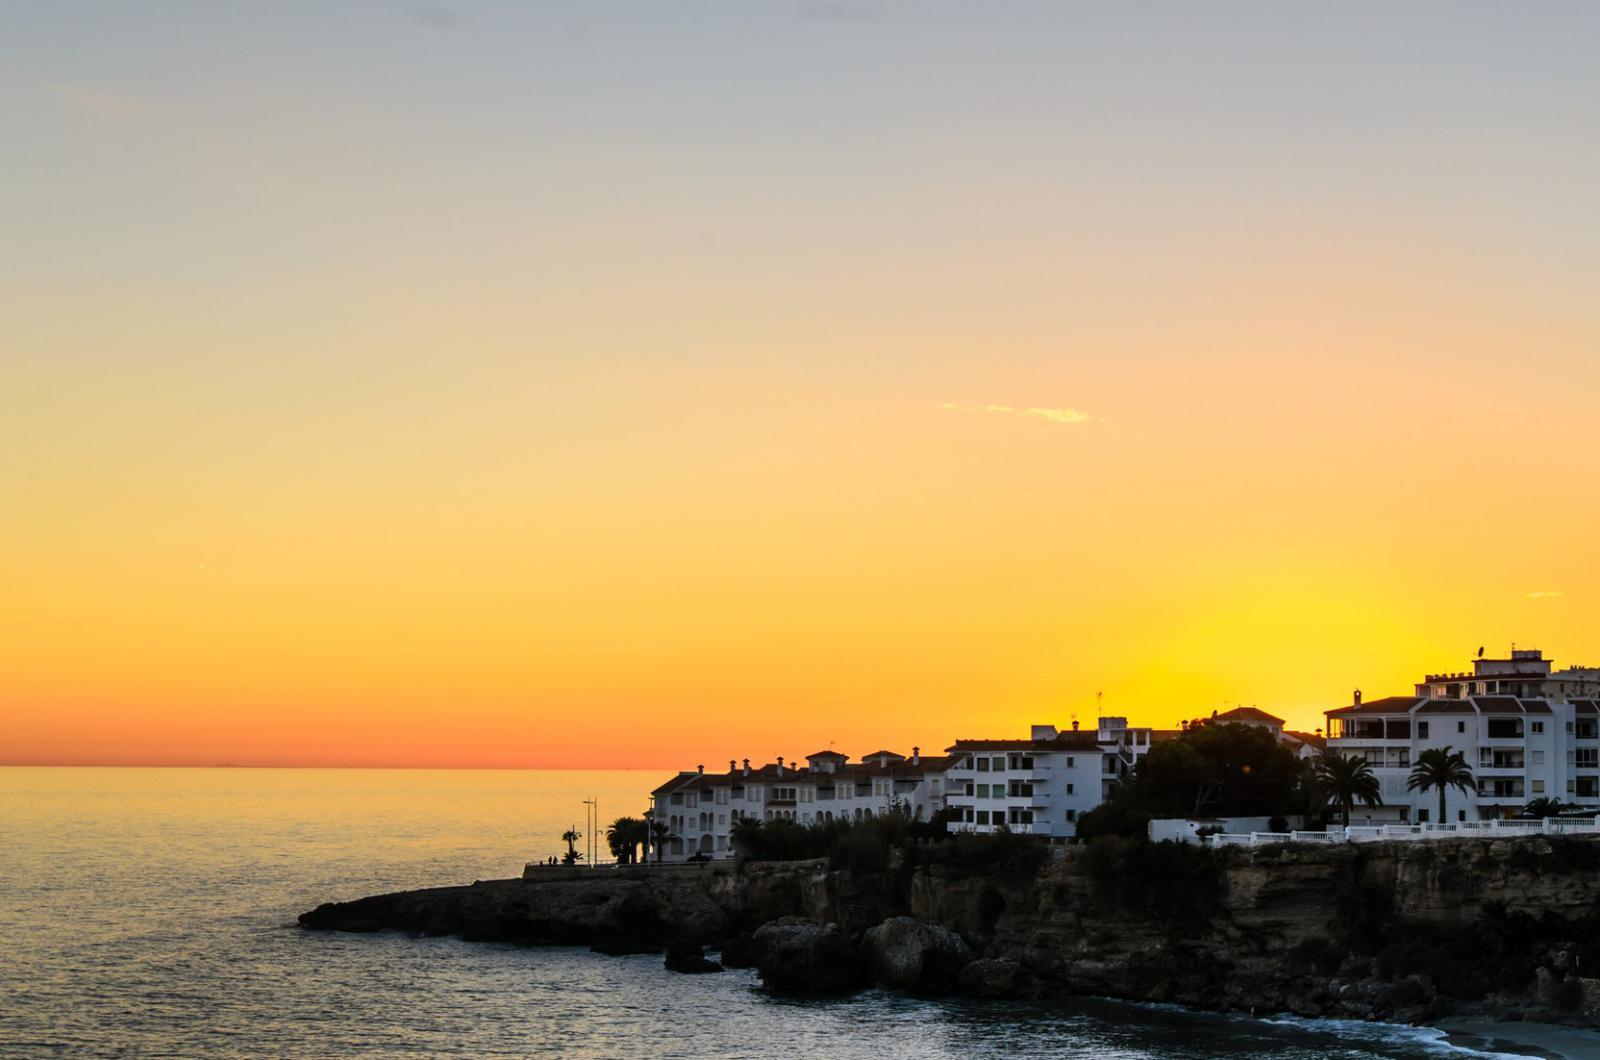 pueblos andaluces con encanto Abendstimmung in Nerja Spanien